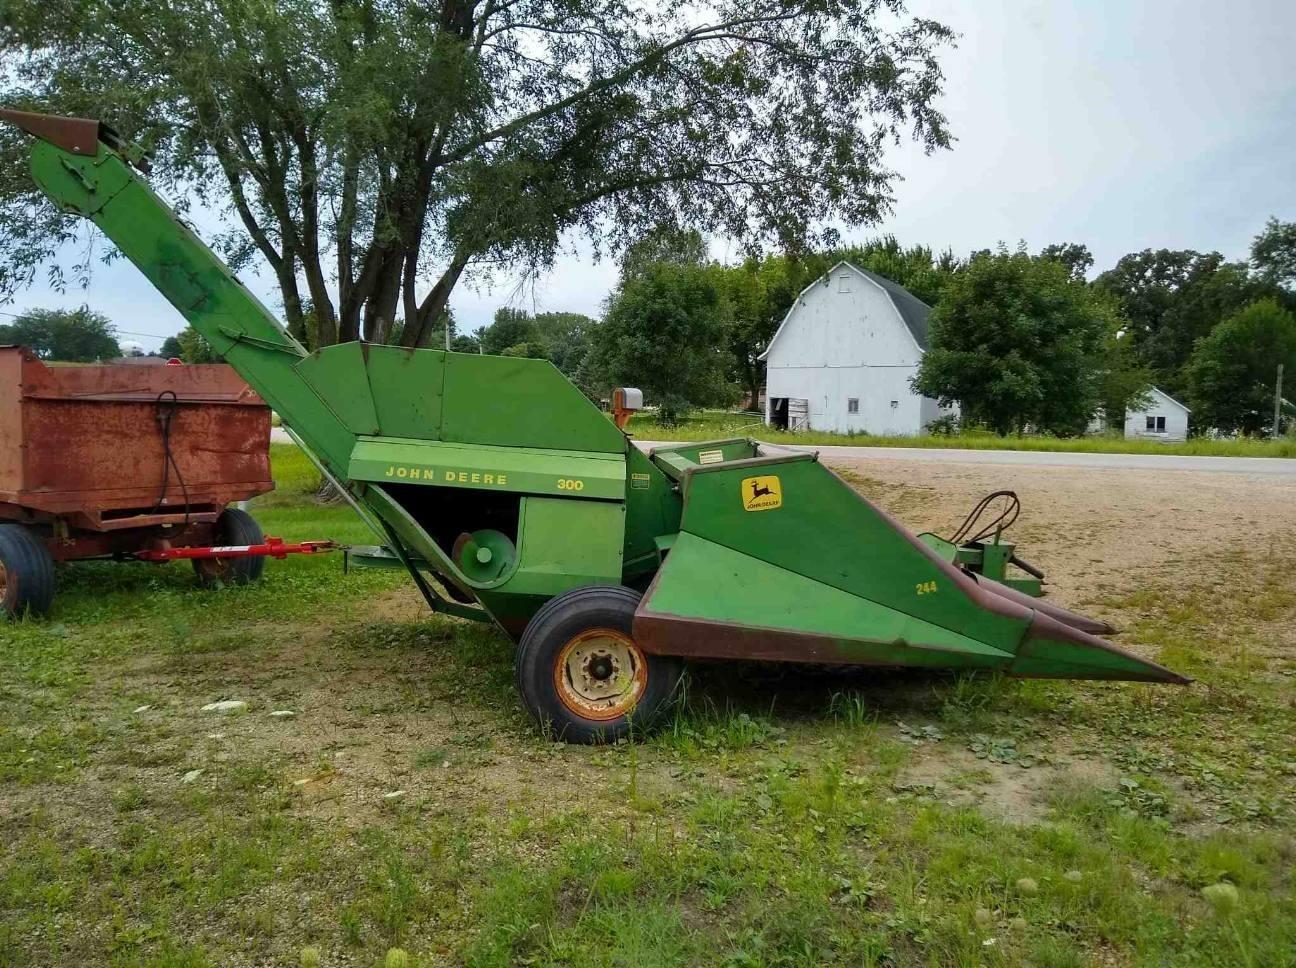 1975 John Deere 300 Corn Picker